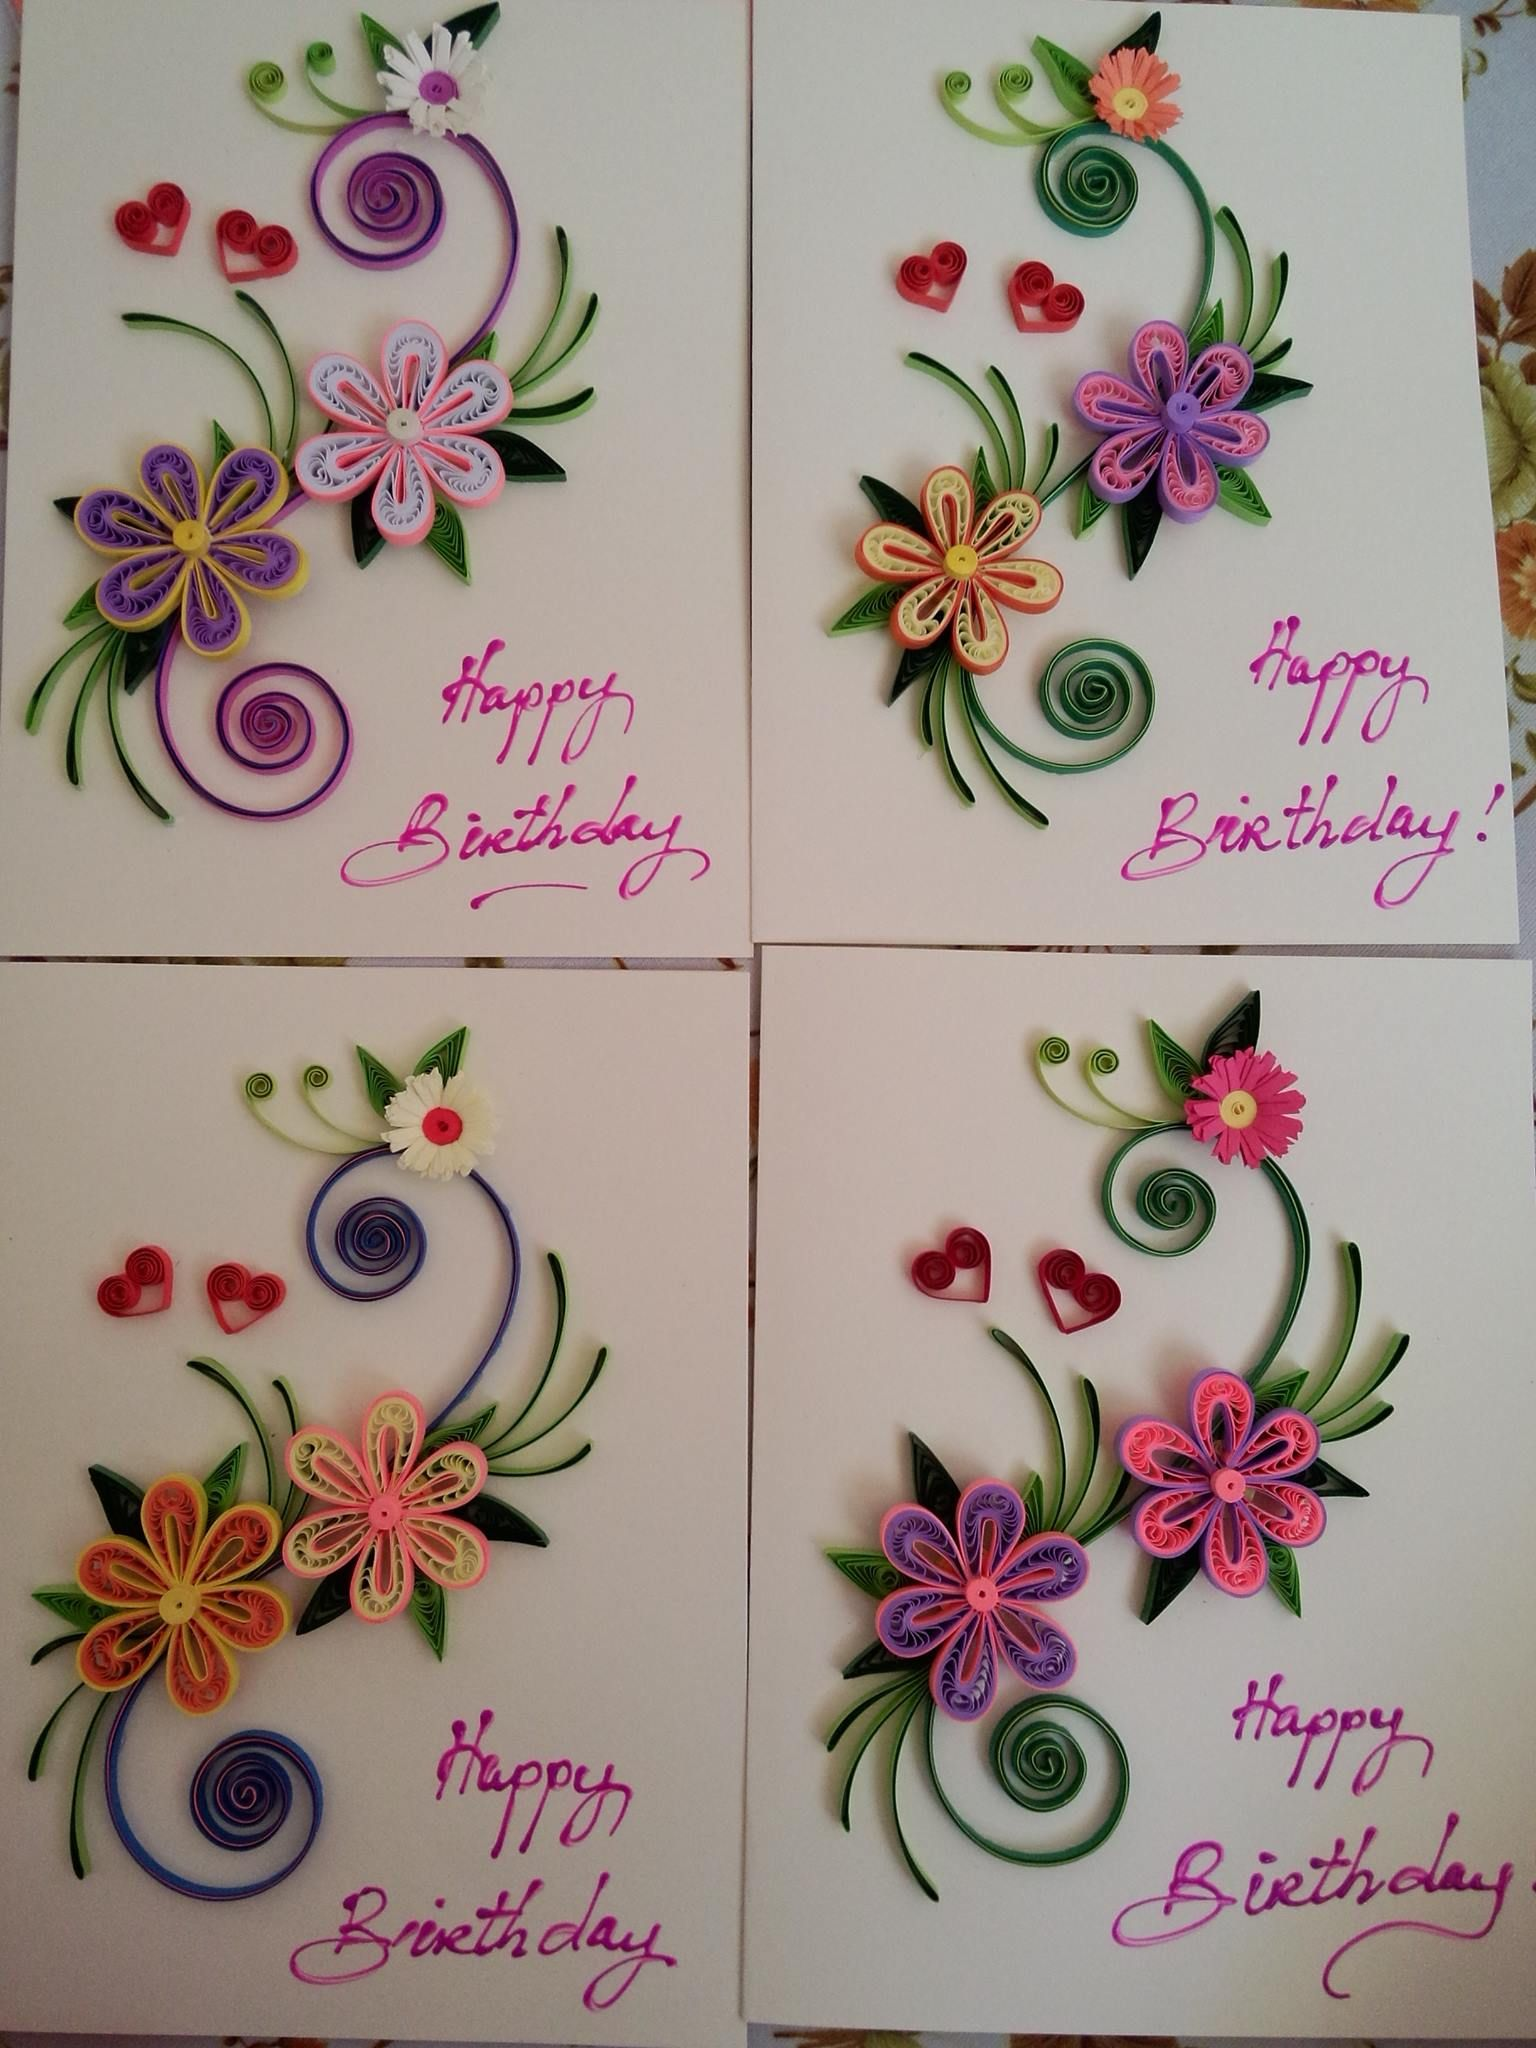 Quilling art ideaspaper cardspaper also pin by carleni clop on casa pinterest paper rh